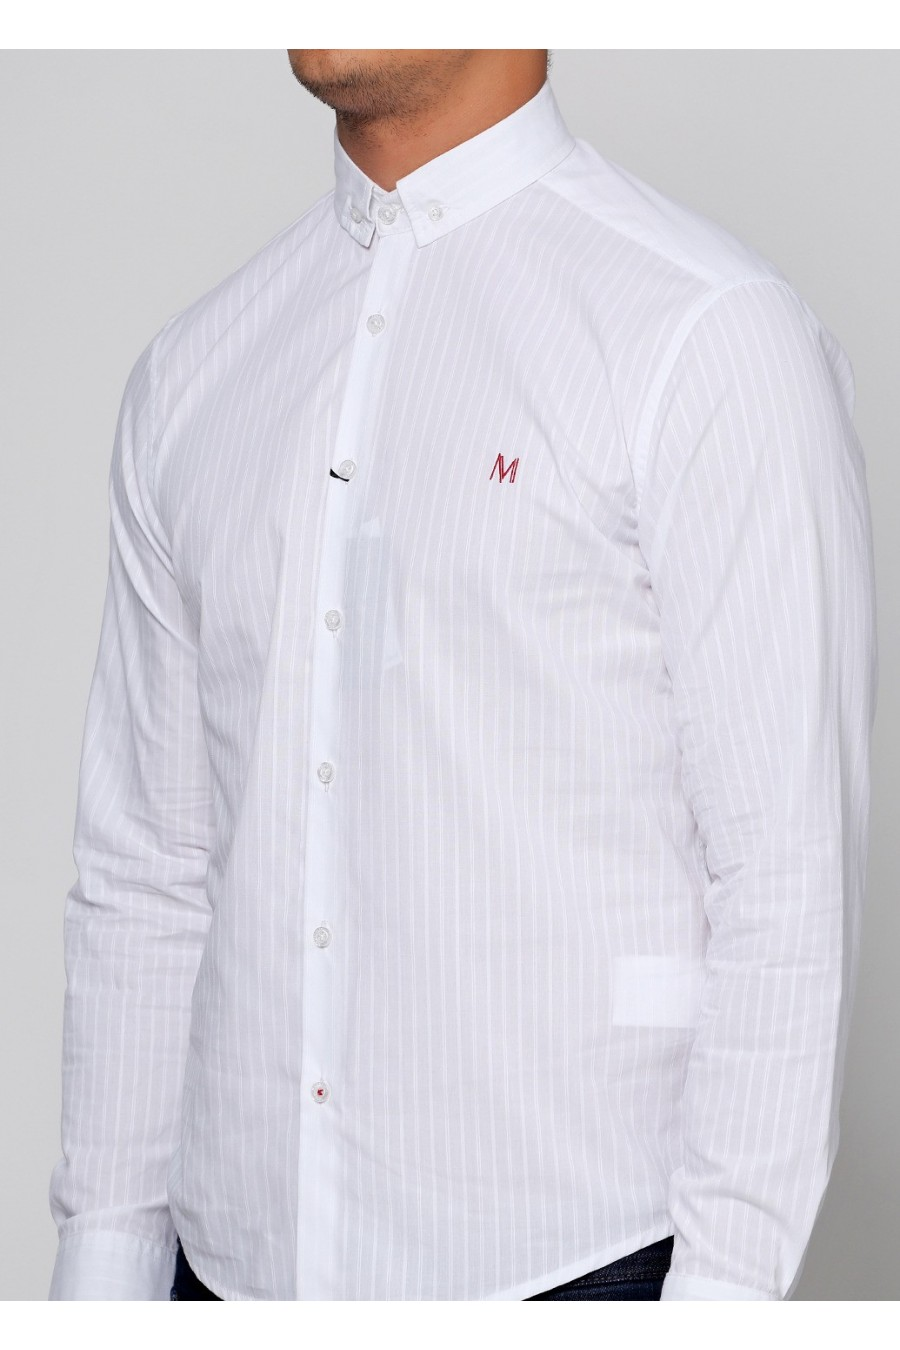 Мужская рубашка S-119-17